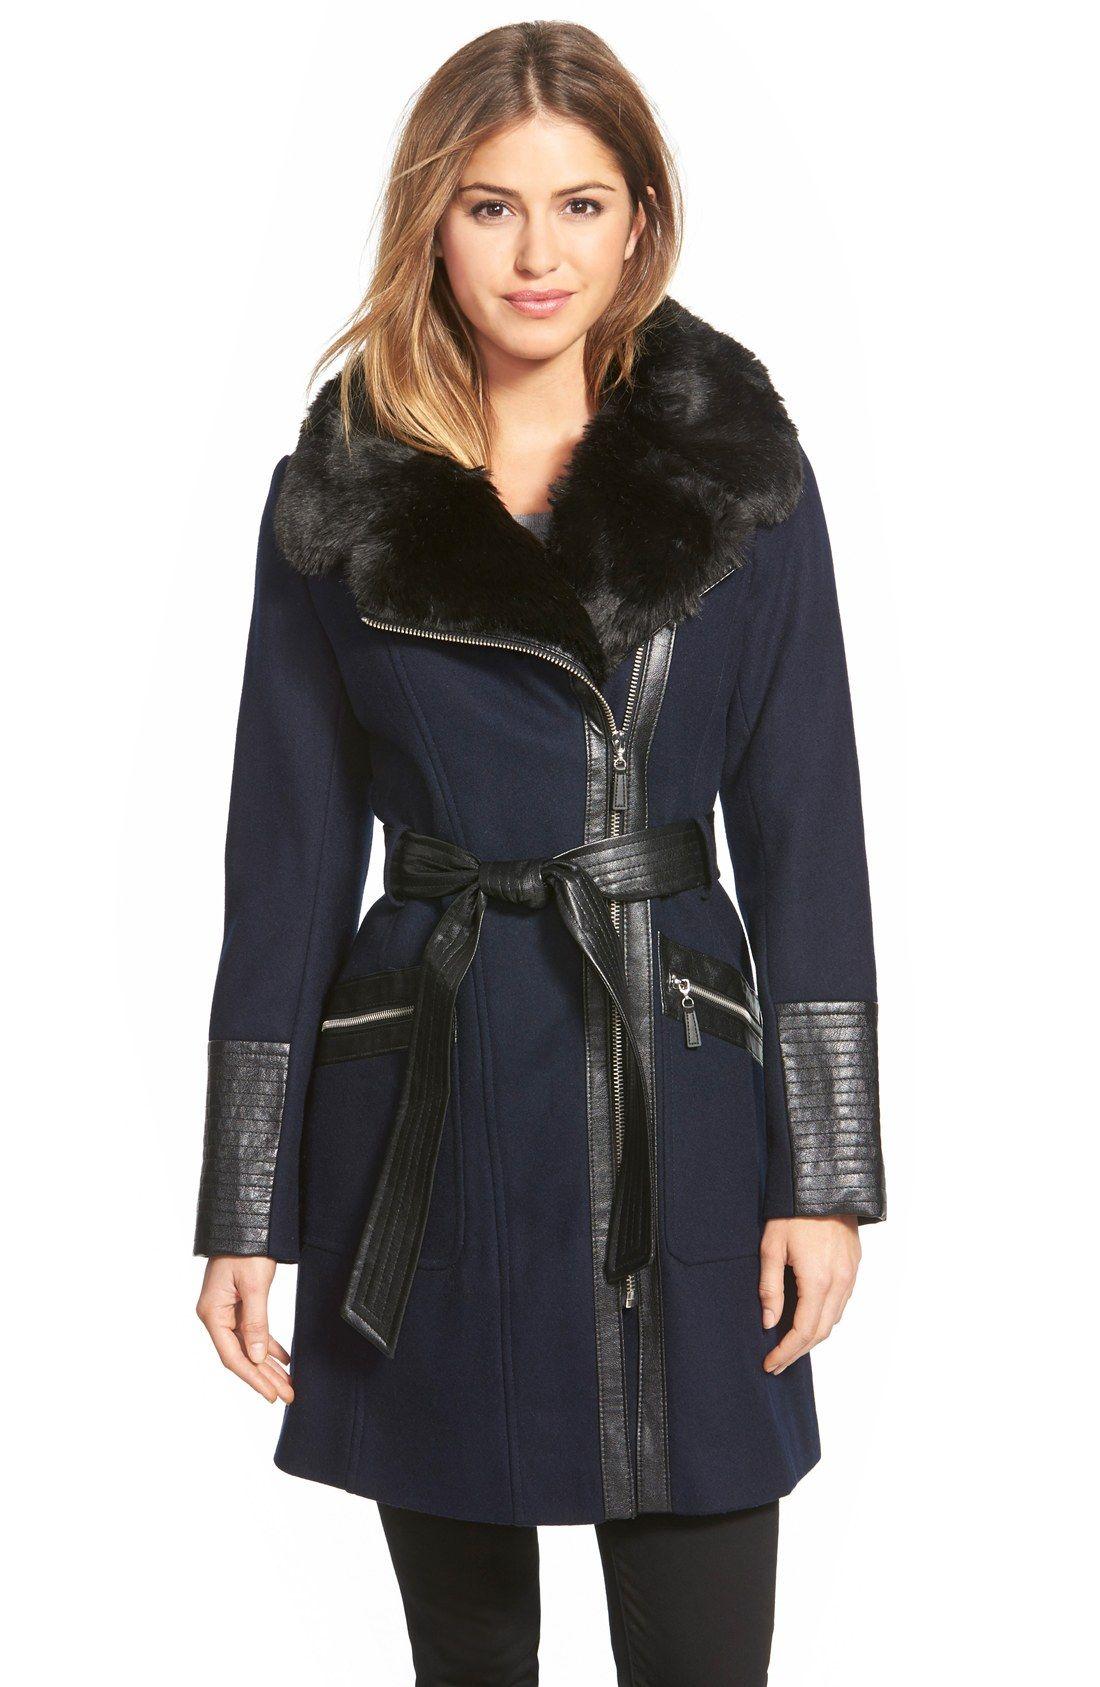 adfb4b551d6 Via Spiga Faux Leather   Faux Fur Trim Belted Wool Blend Coat